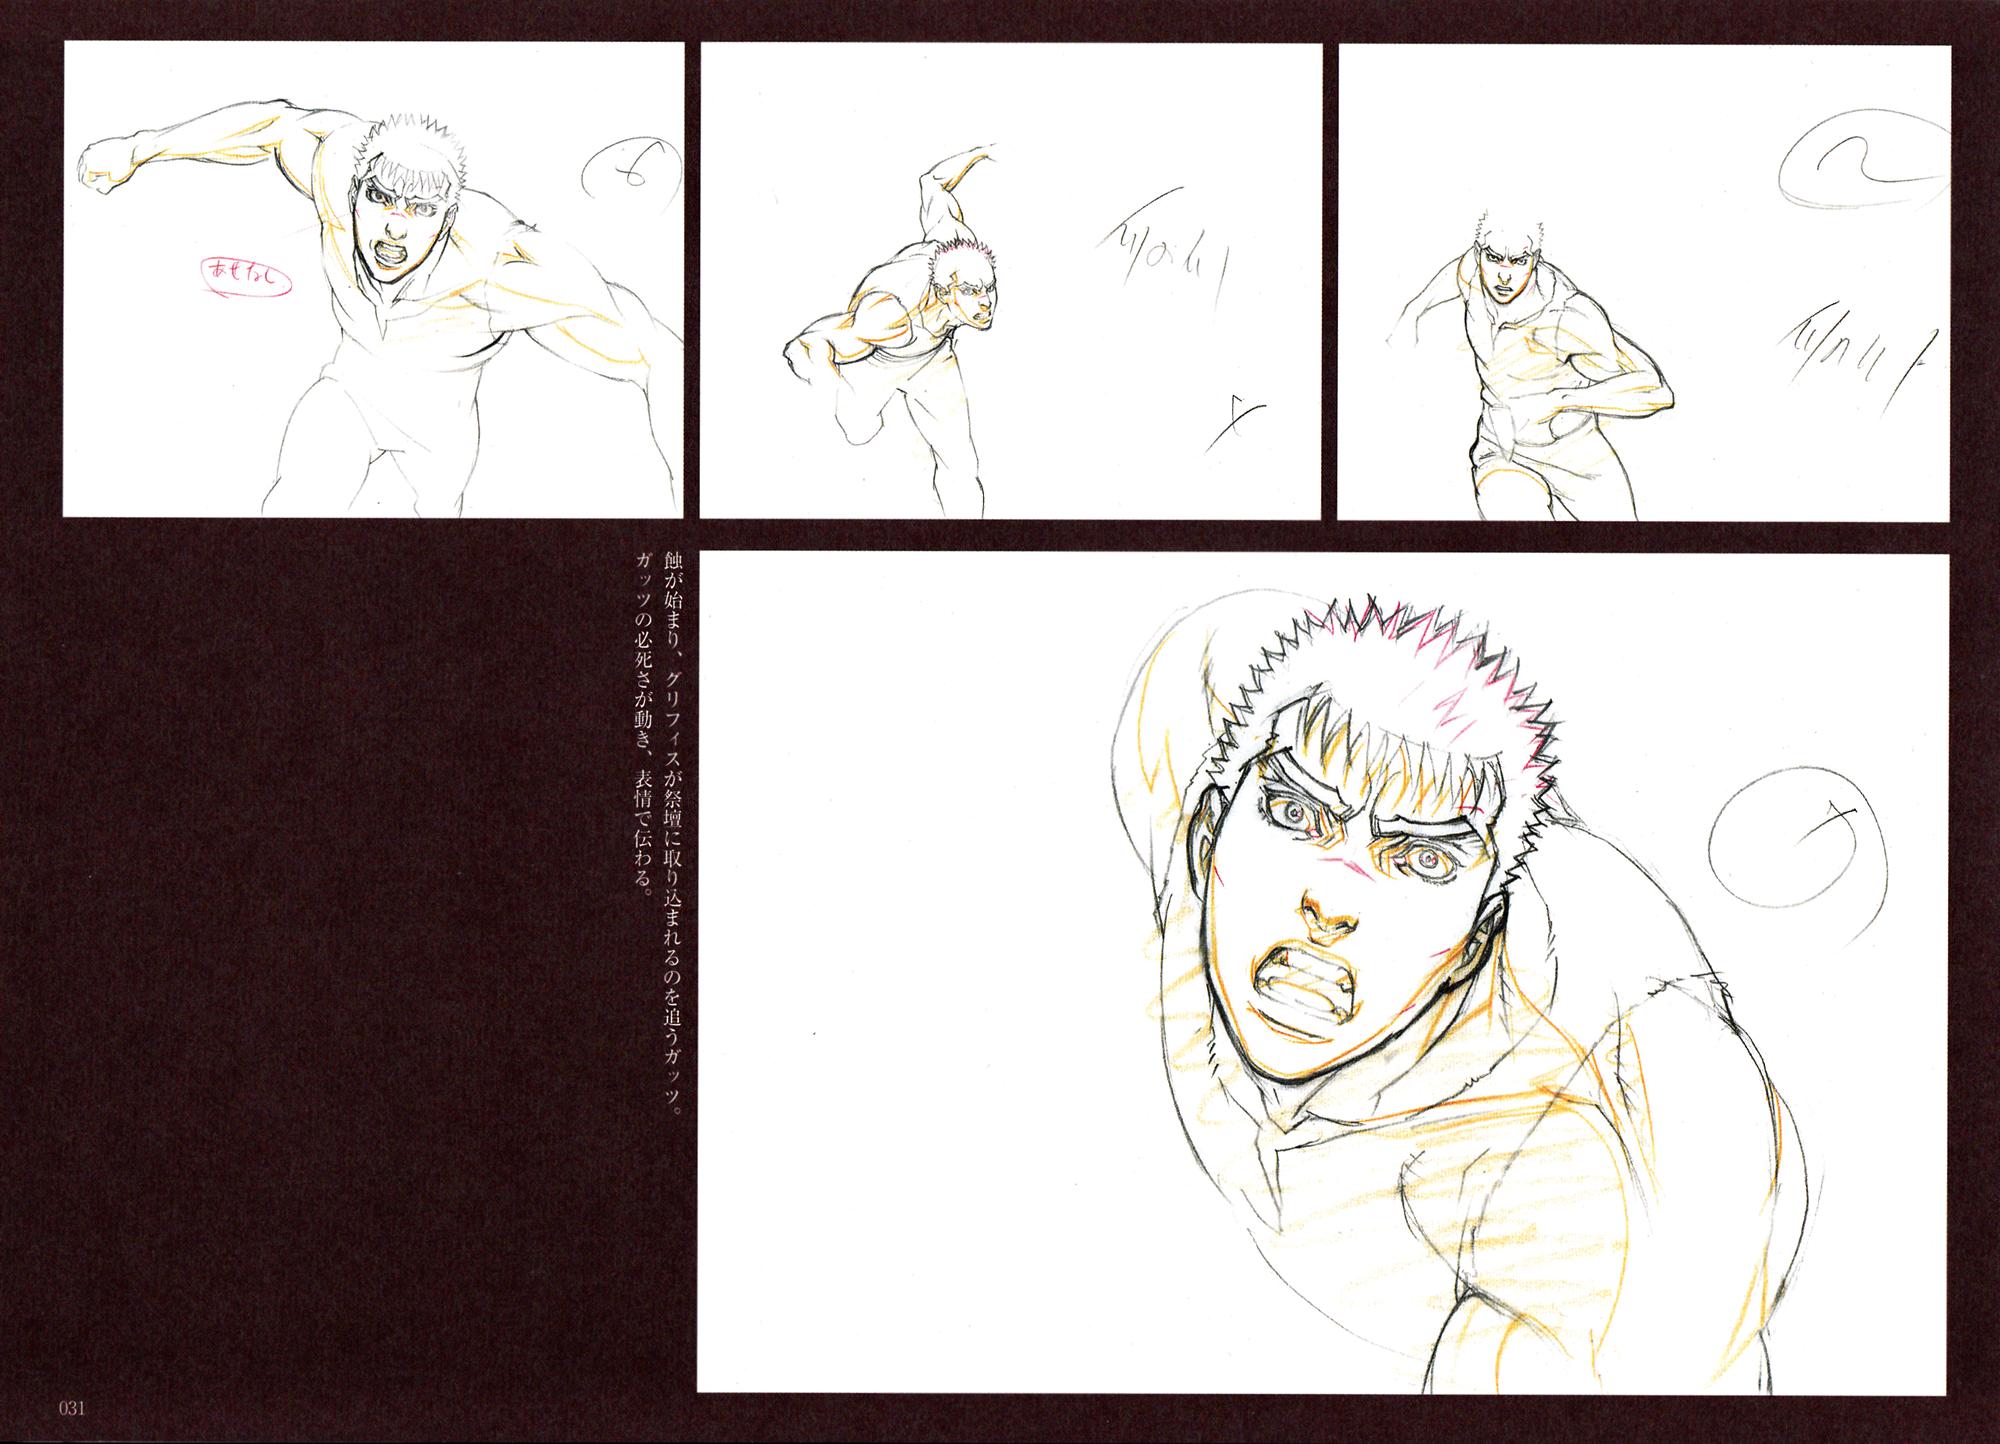 Pin By Alyona Goreckaya On Berserk Berserk Artwork Anime